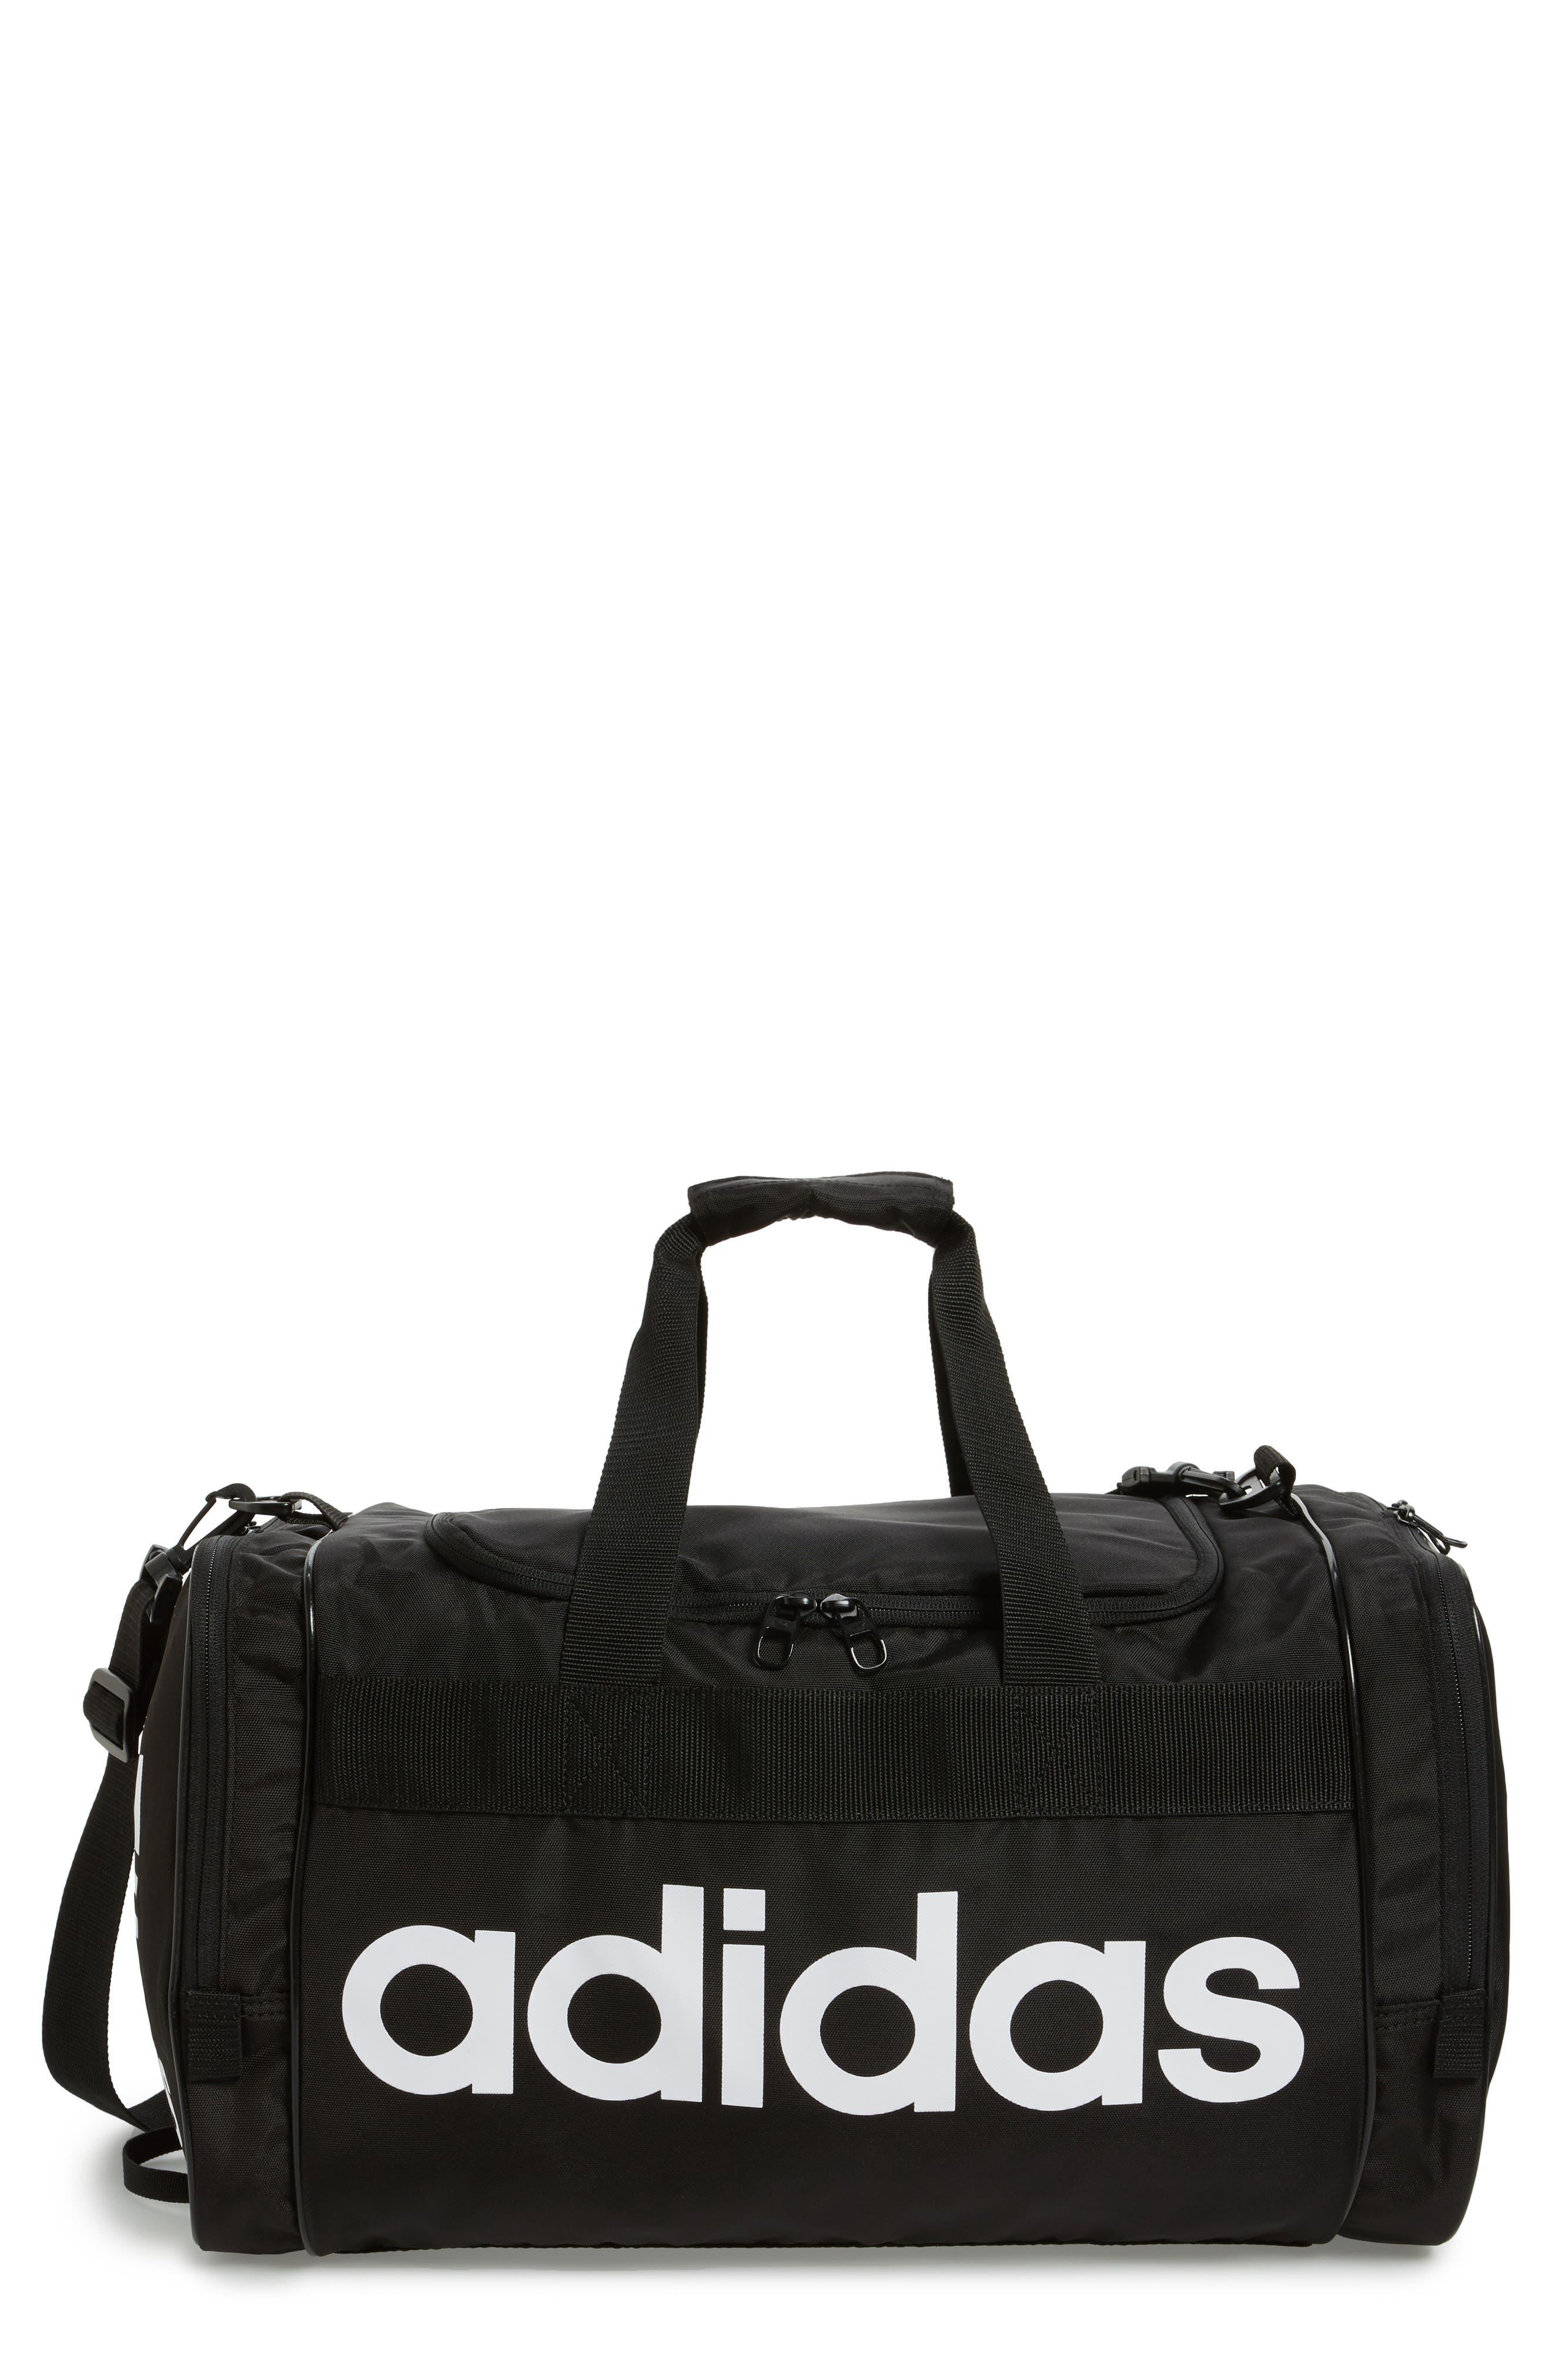 ADIDAS ORIGINALS Santiago Duffel Bag, Main, color, BLACK/ WHITE